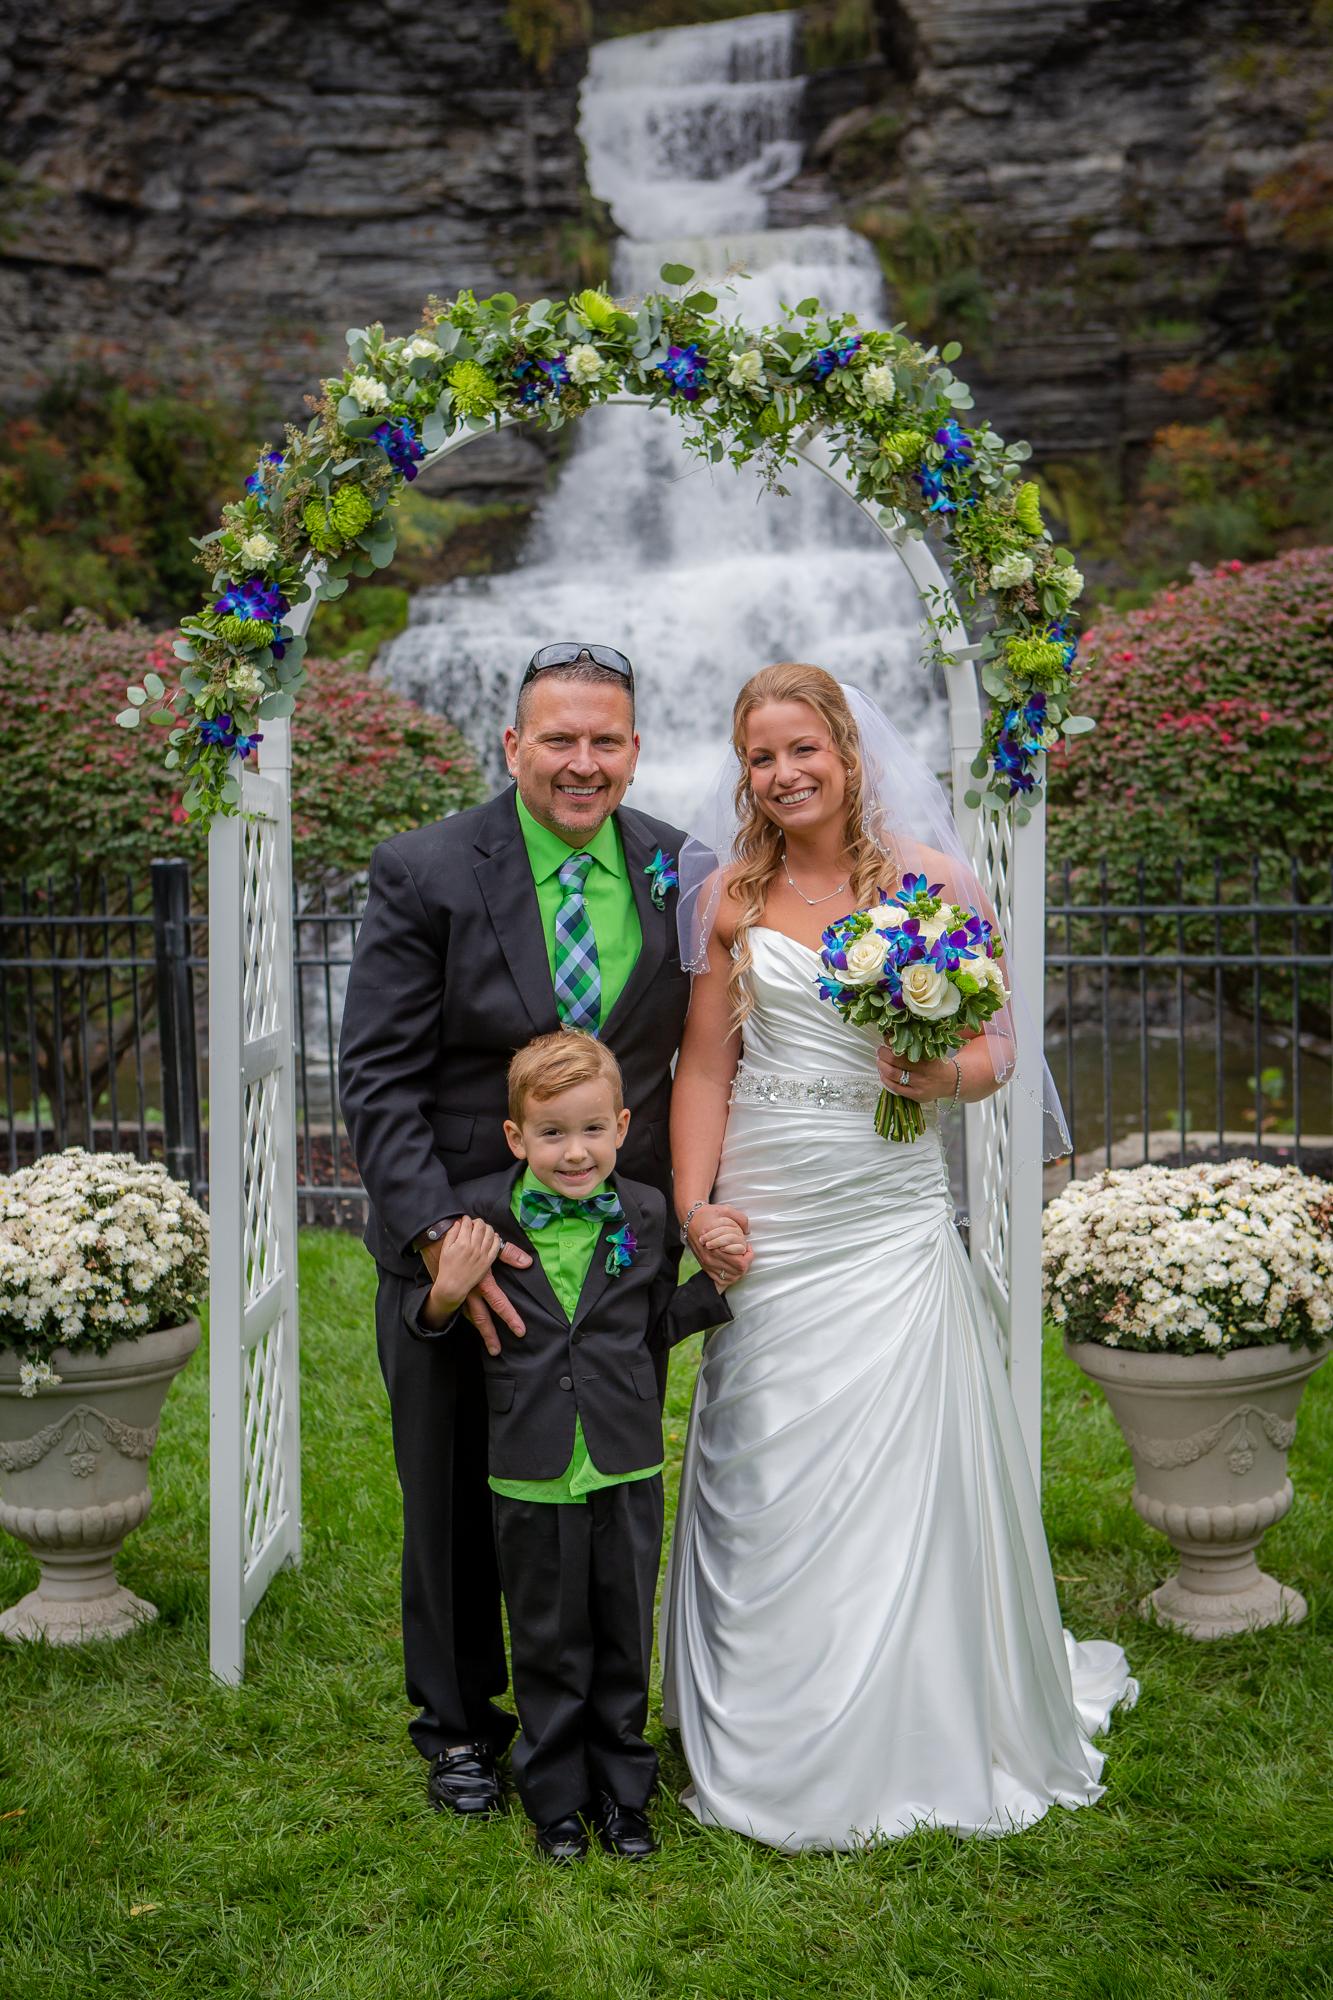 Raddison-Hotel-Corning-NY-Wedding-3975.jpg